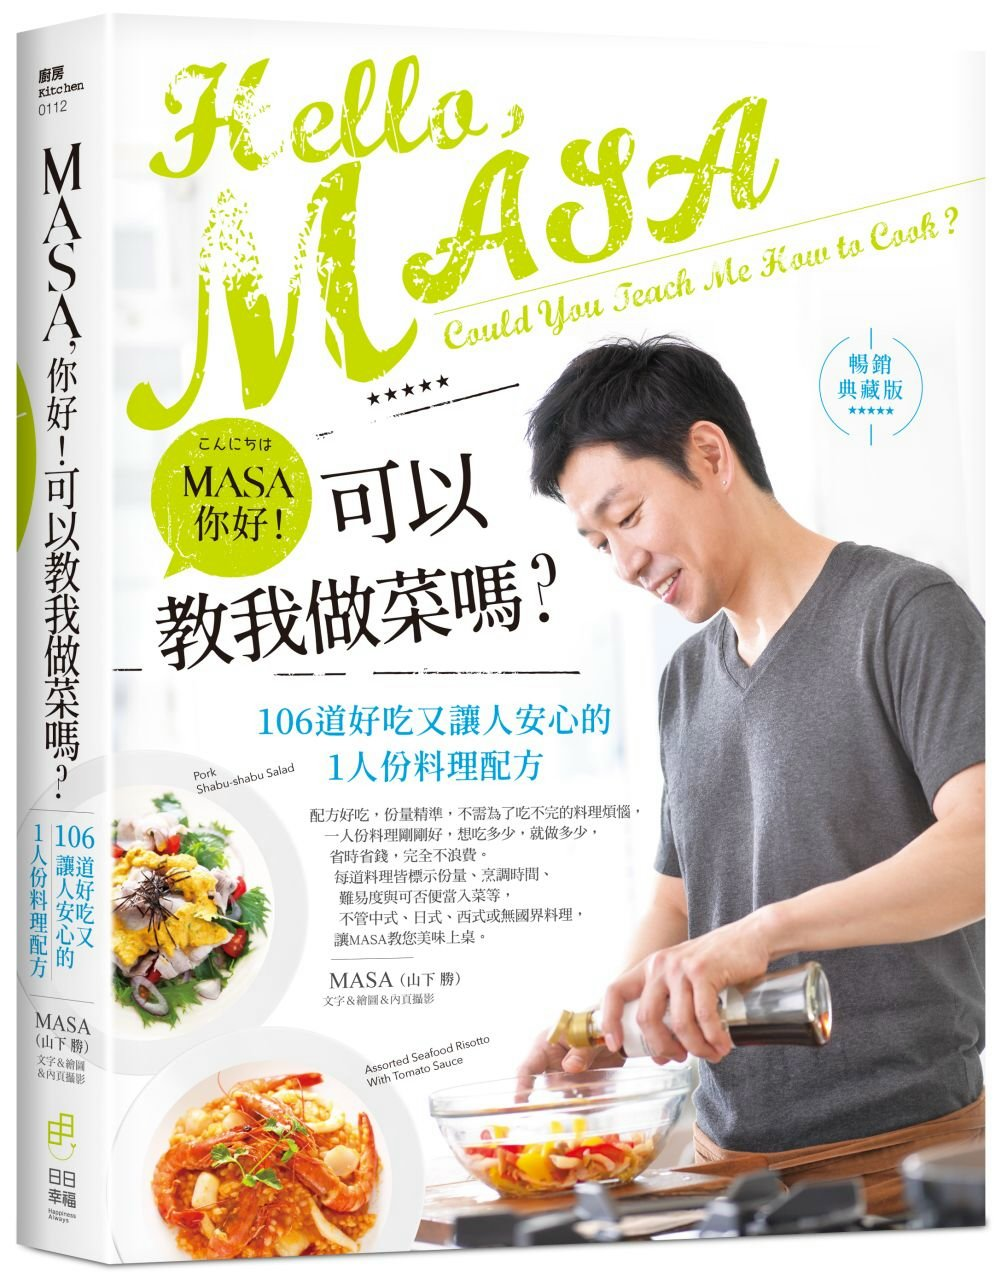 MASA,你好!可以教我做菜嗎...